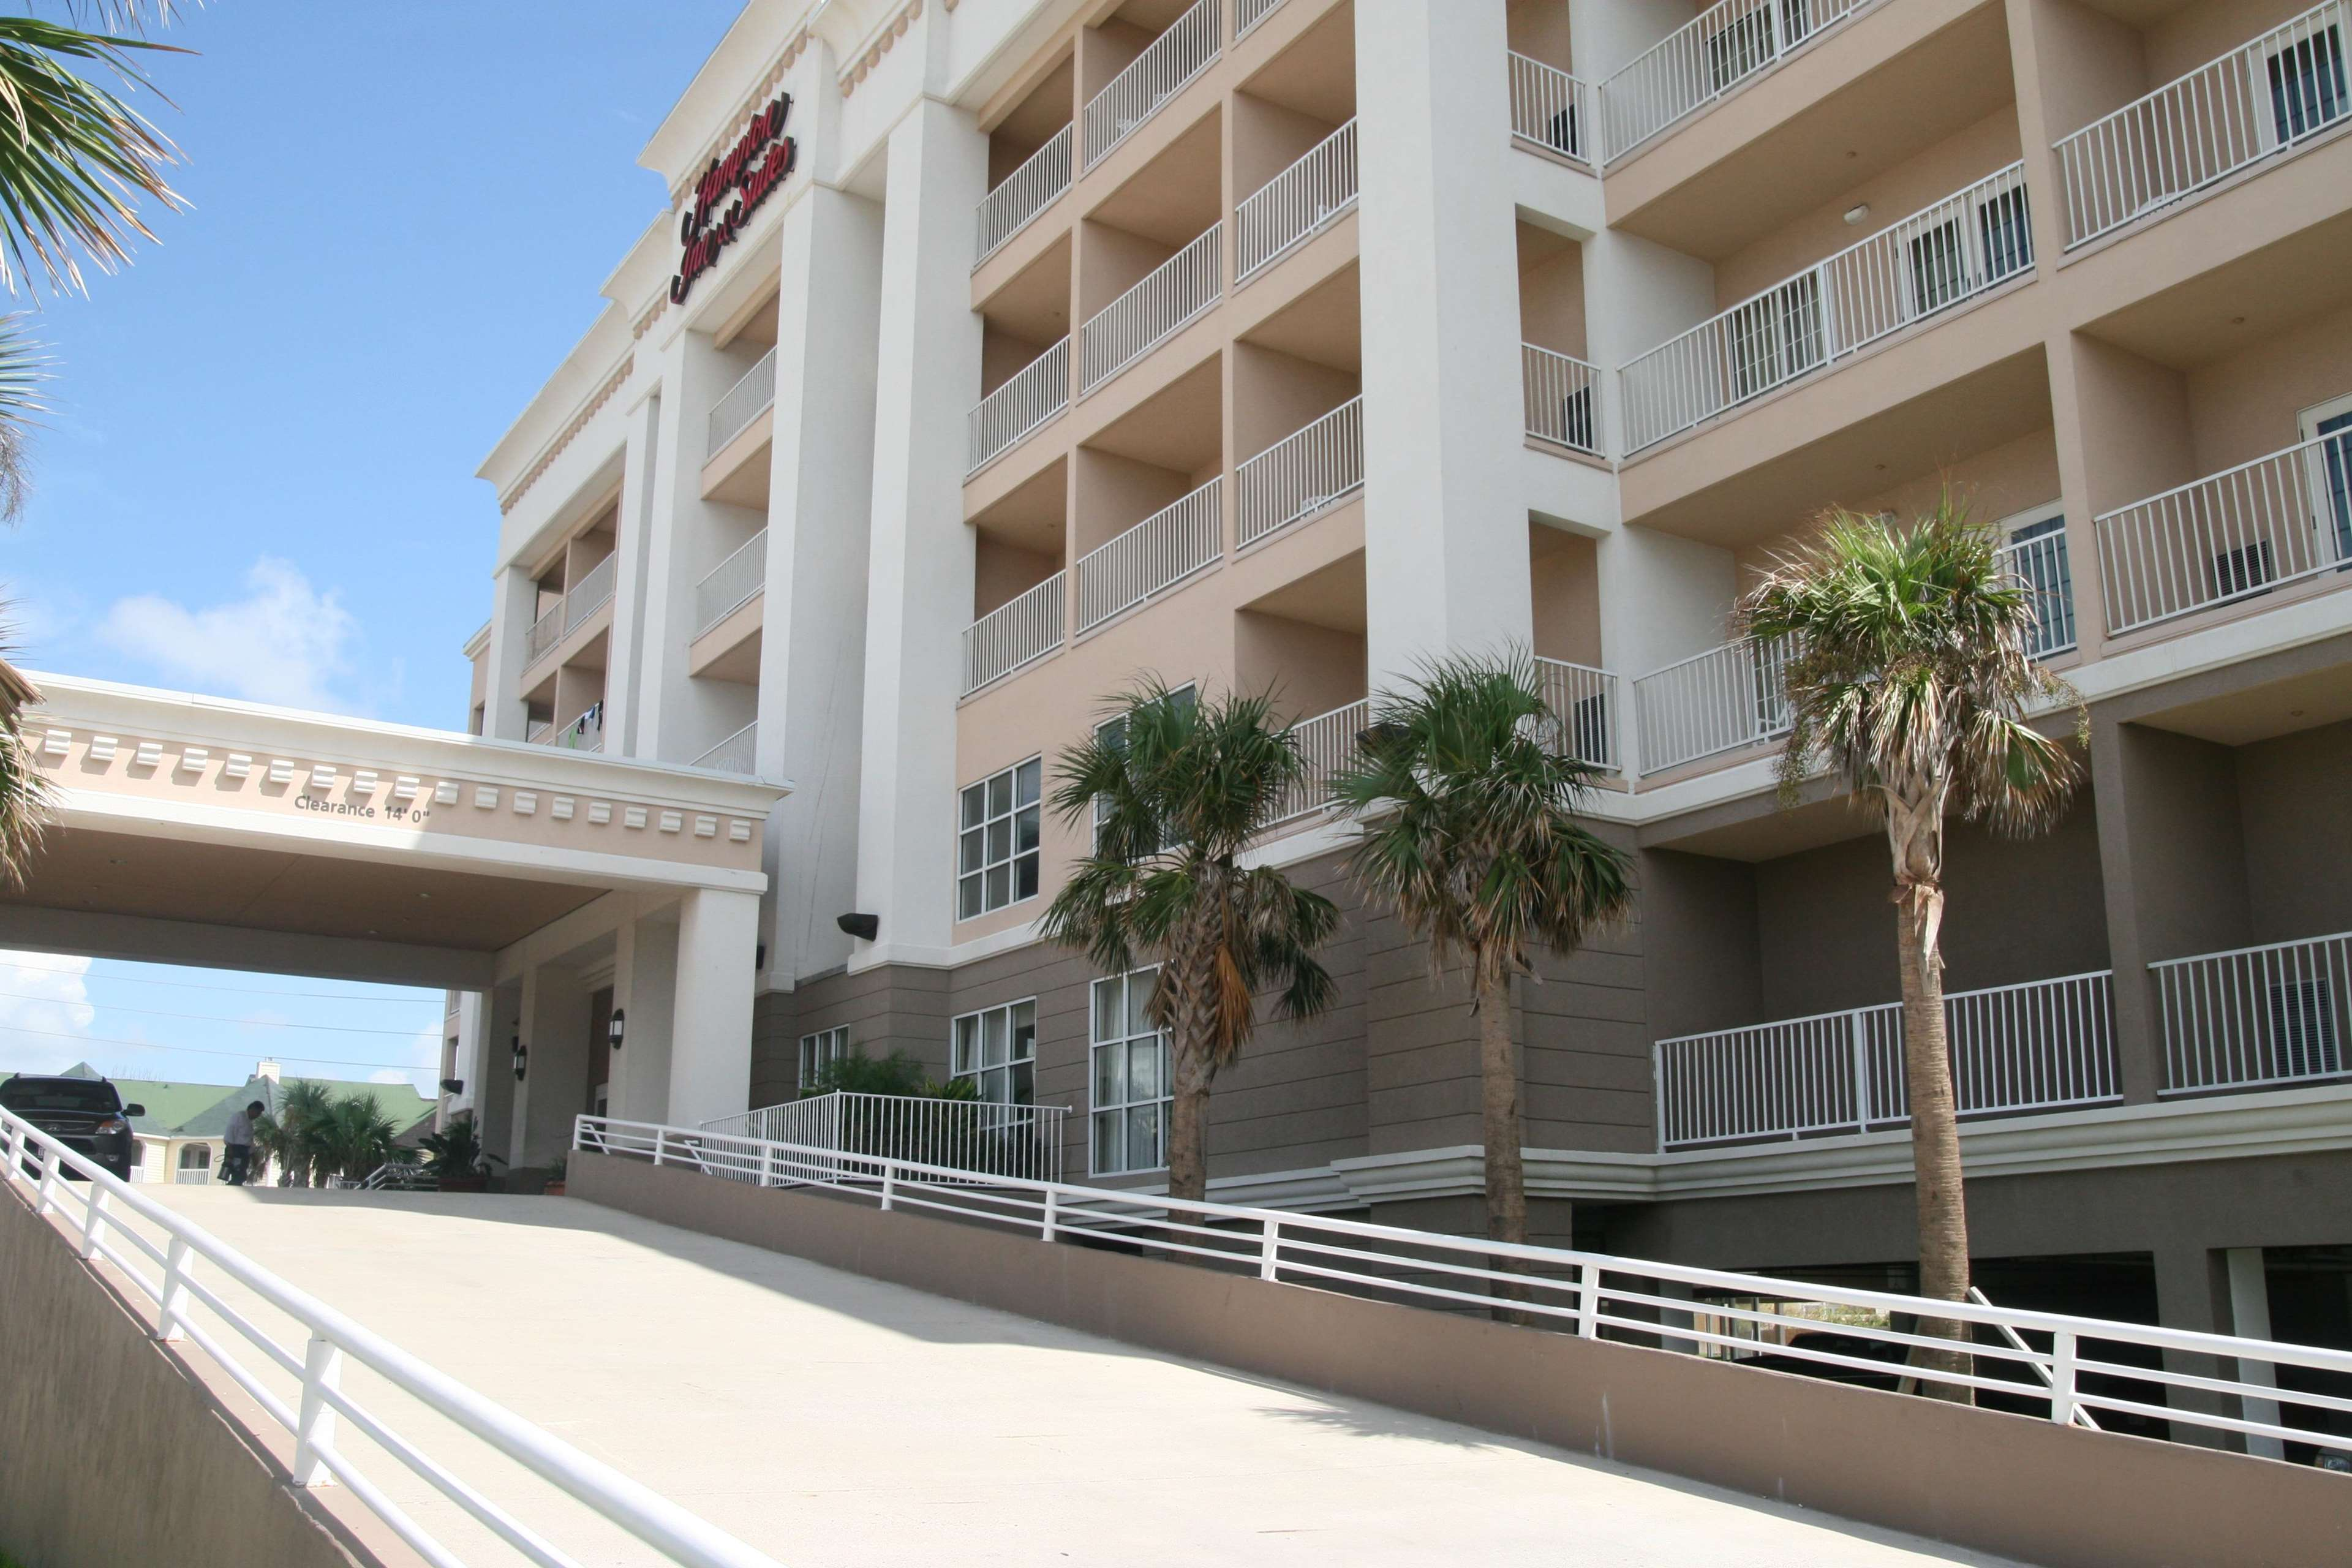 Hampton Inn & Suites Galveston image 3